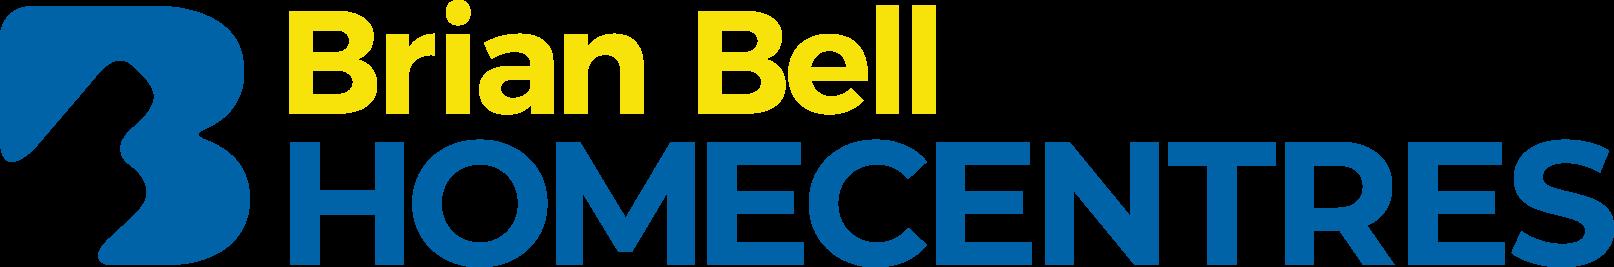 Brian Bell Homecentre